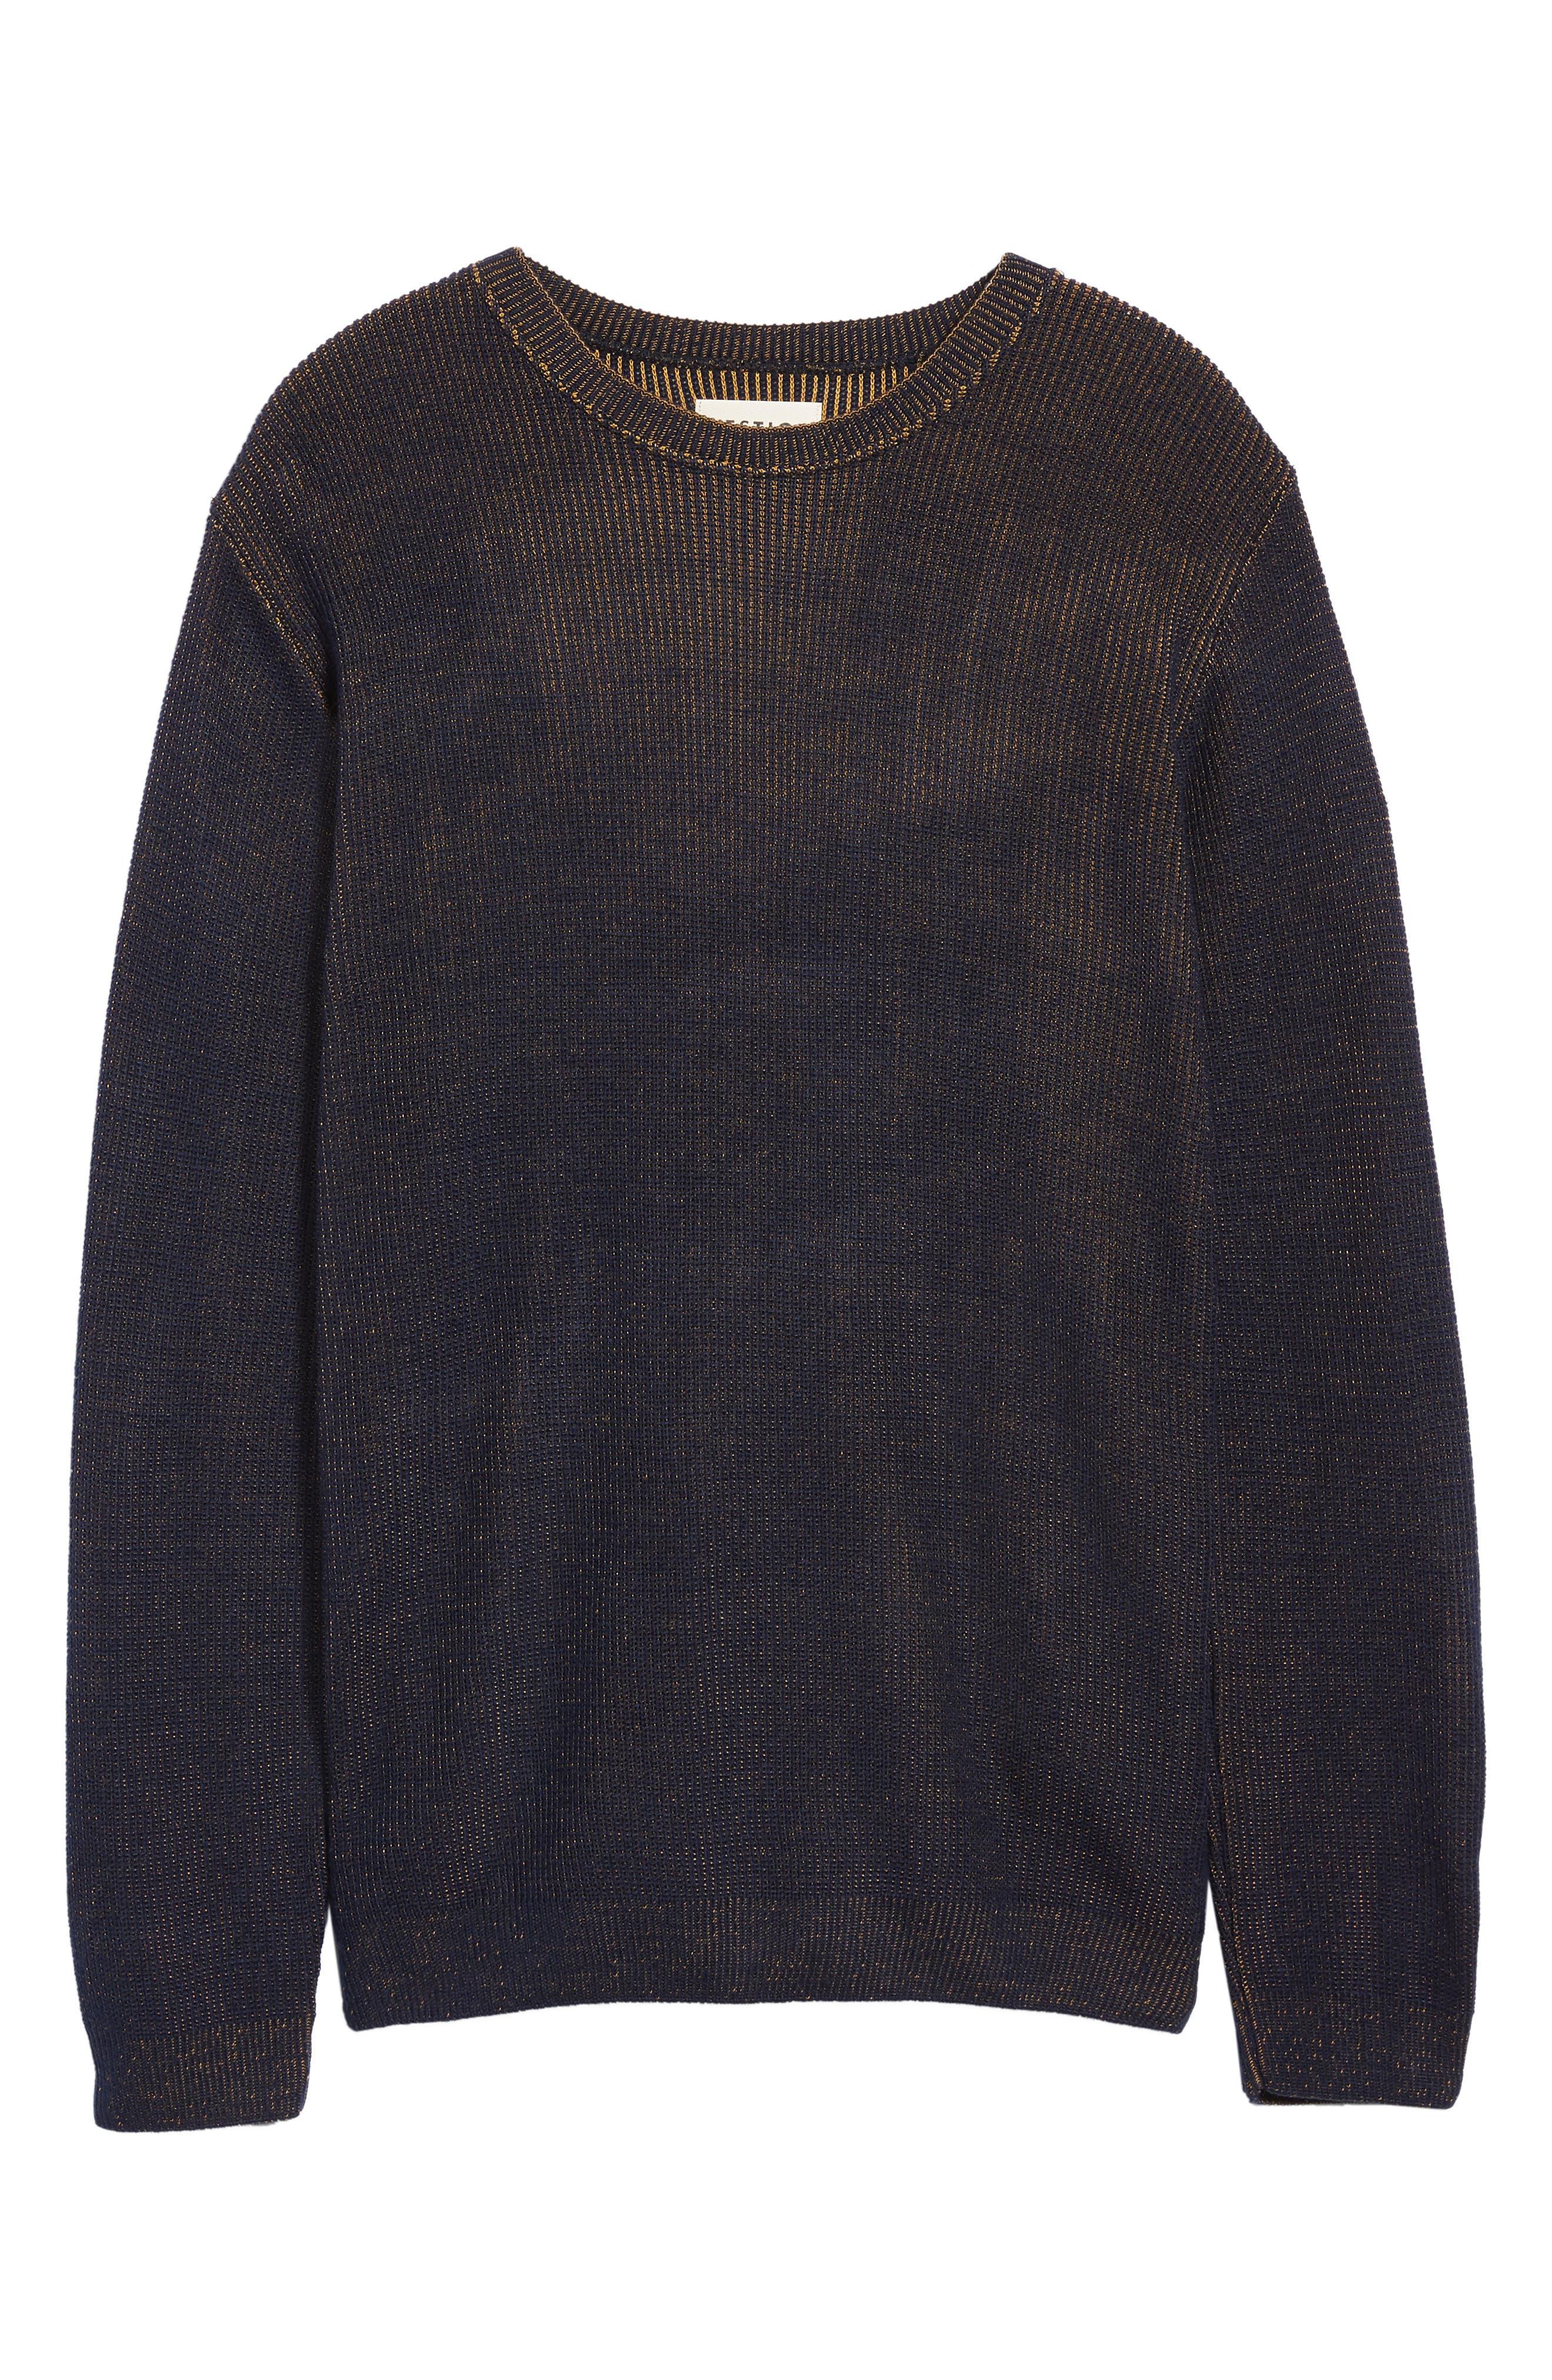 Plaited Crewneck Sweater,                             Alternate thumbnail 6, color,                             NAVY